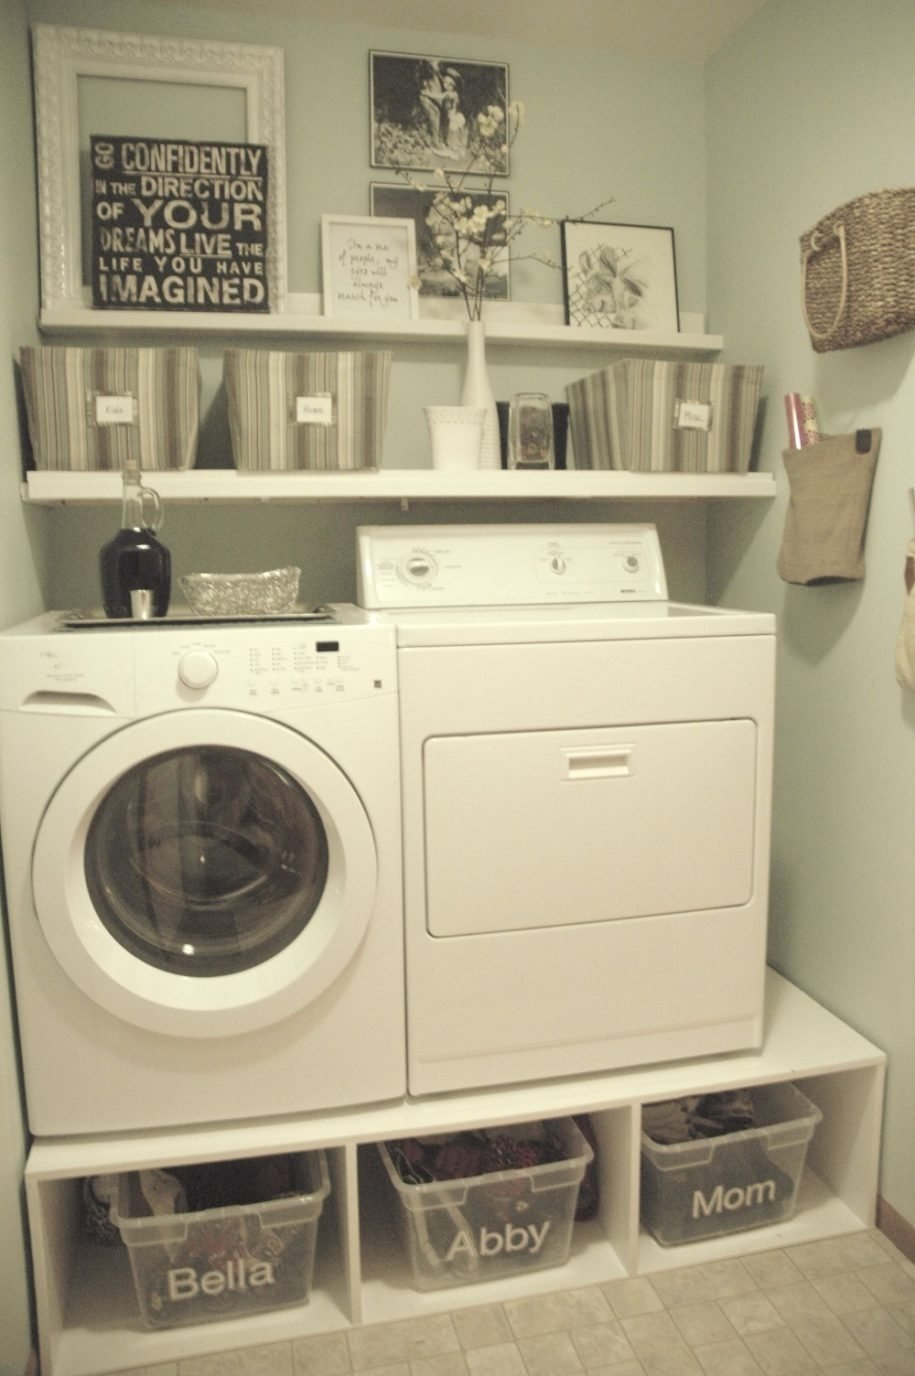 10 Amazing Ideas For Small Laundry Room interior design outstanding small laundry room ideas with flower 2020